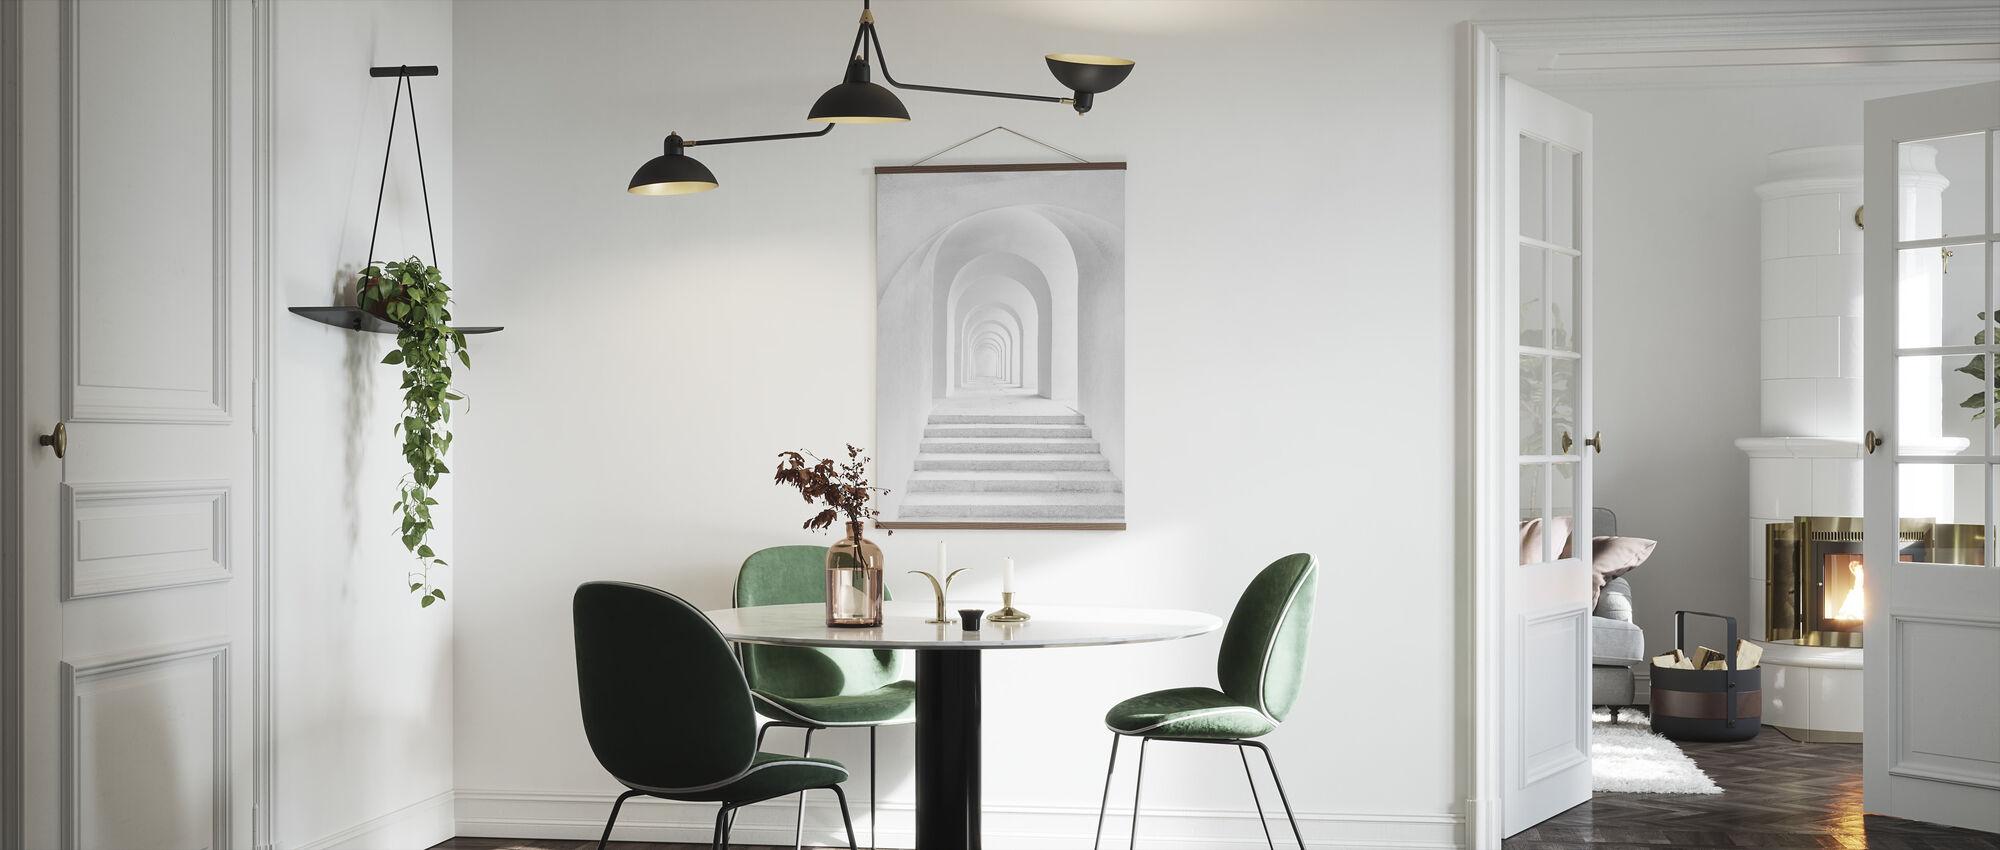 Witte Archway - Poster - Keuken